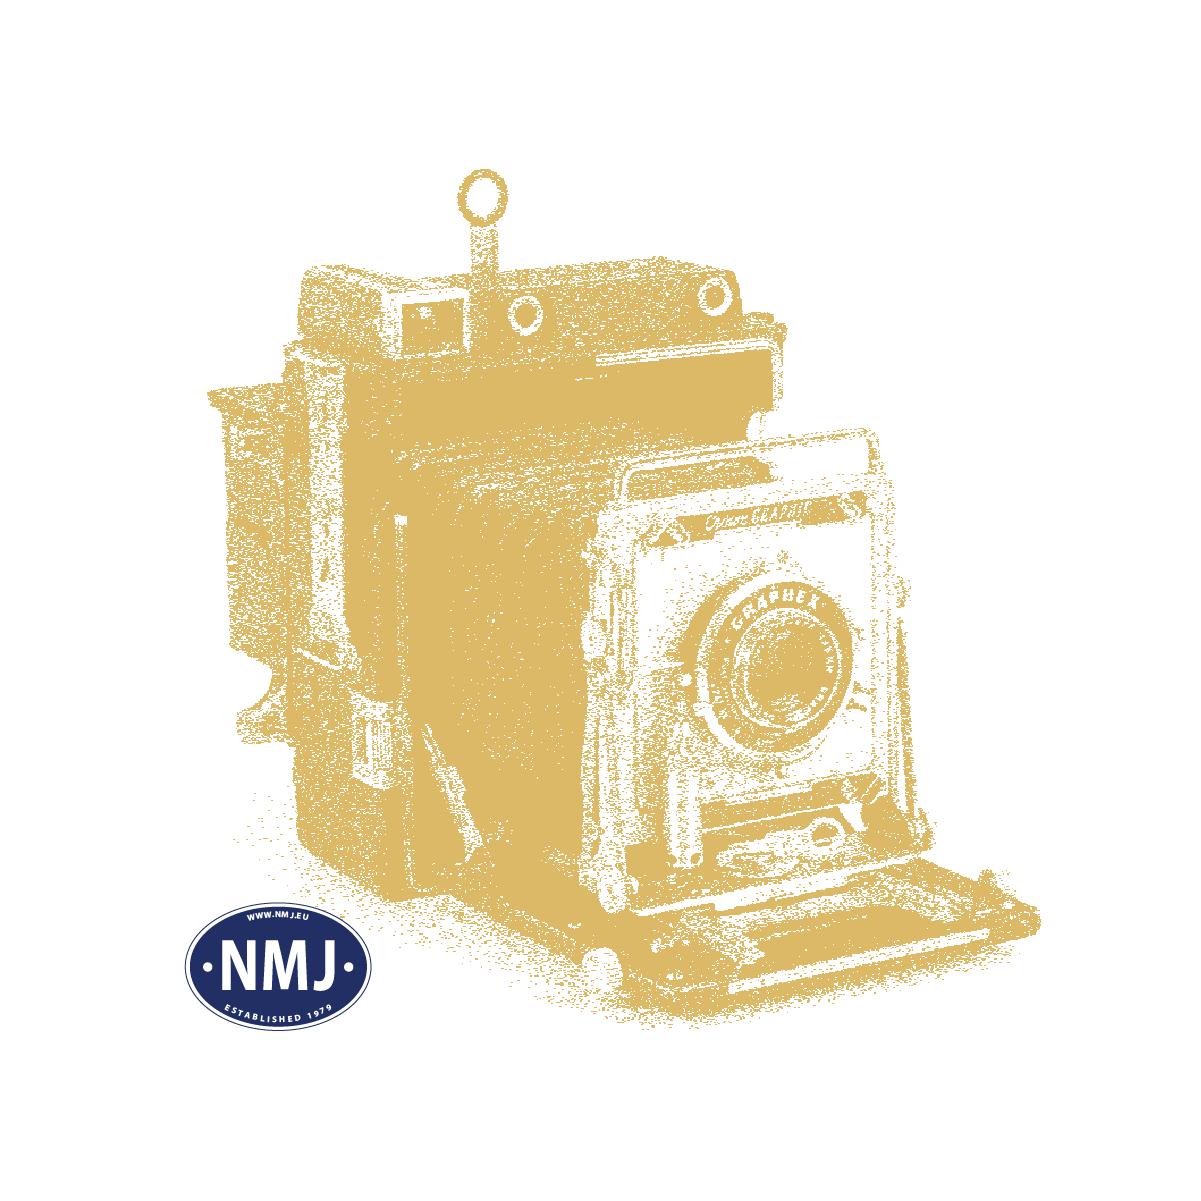 "NMJT90010 - NMJ Topline NSB Di3a 607 ""Nohab"", Mellomdesign, DC"